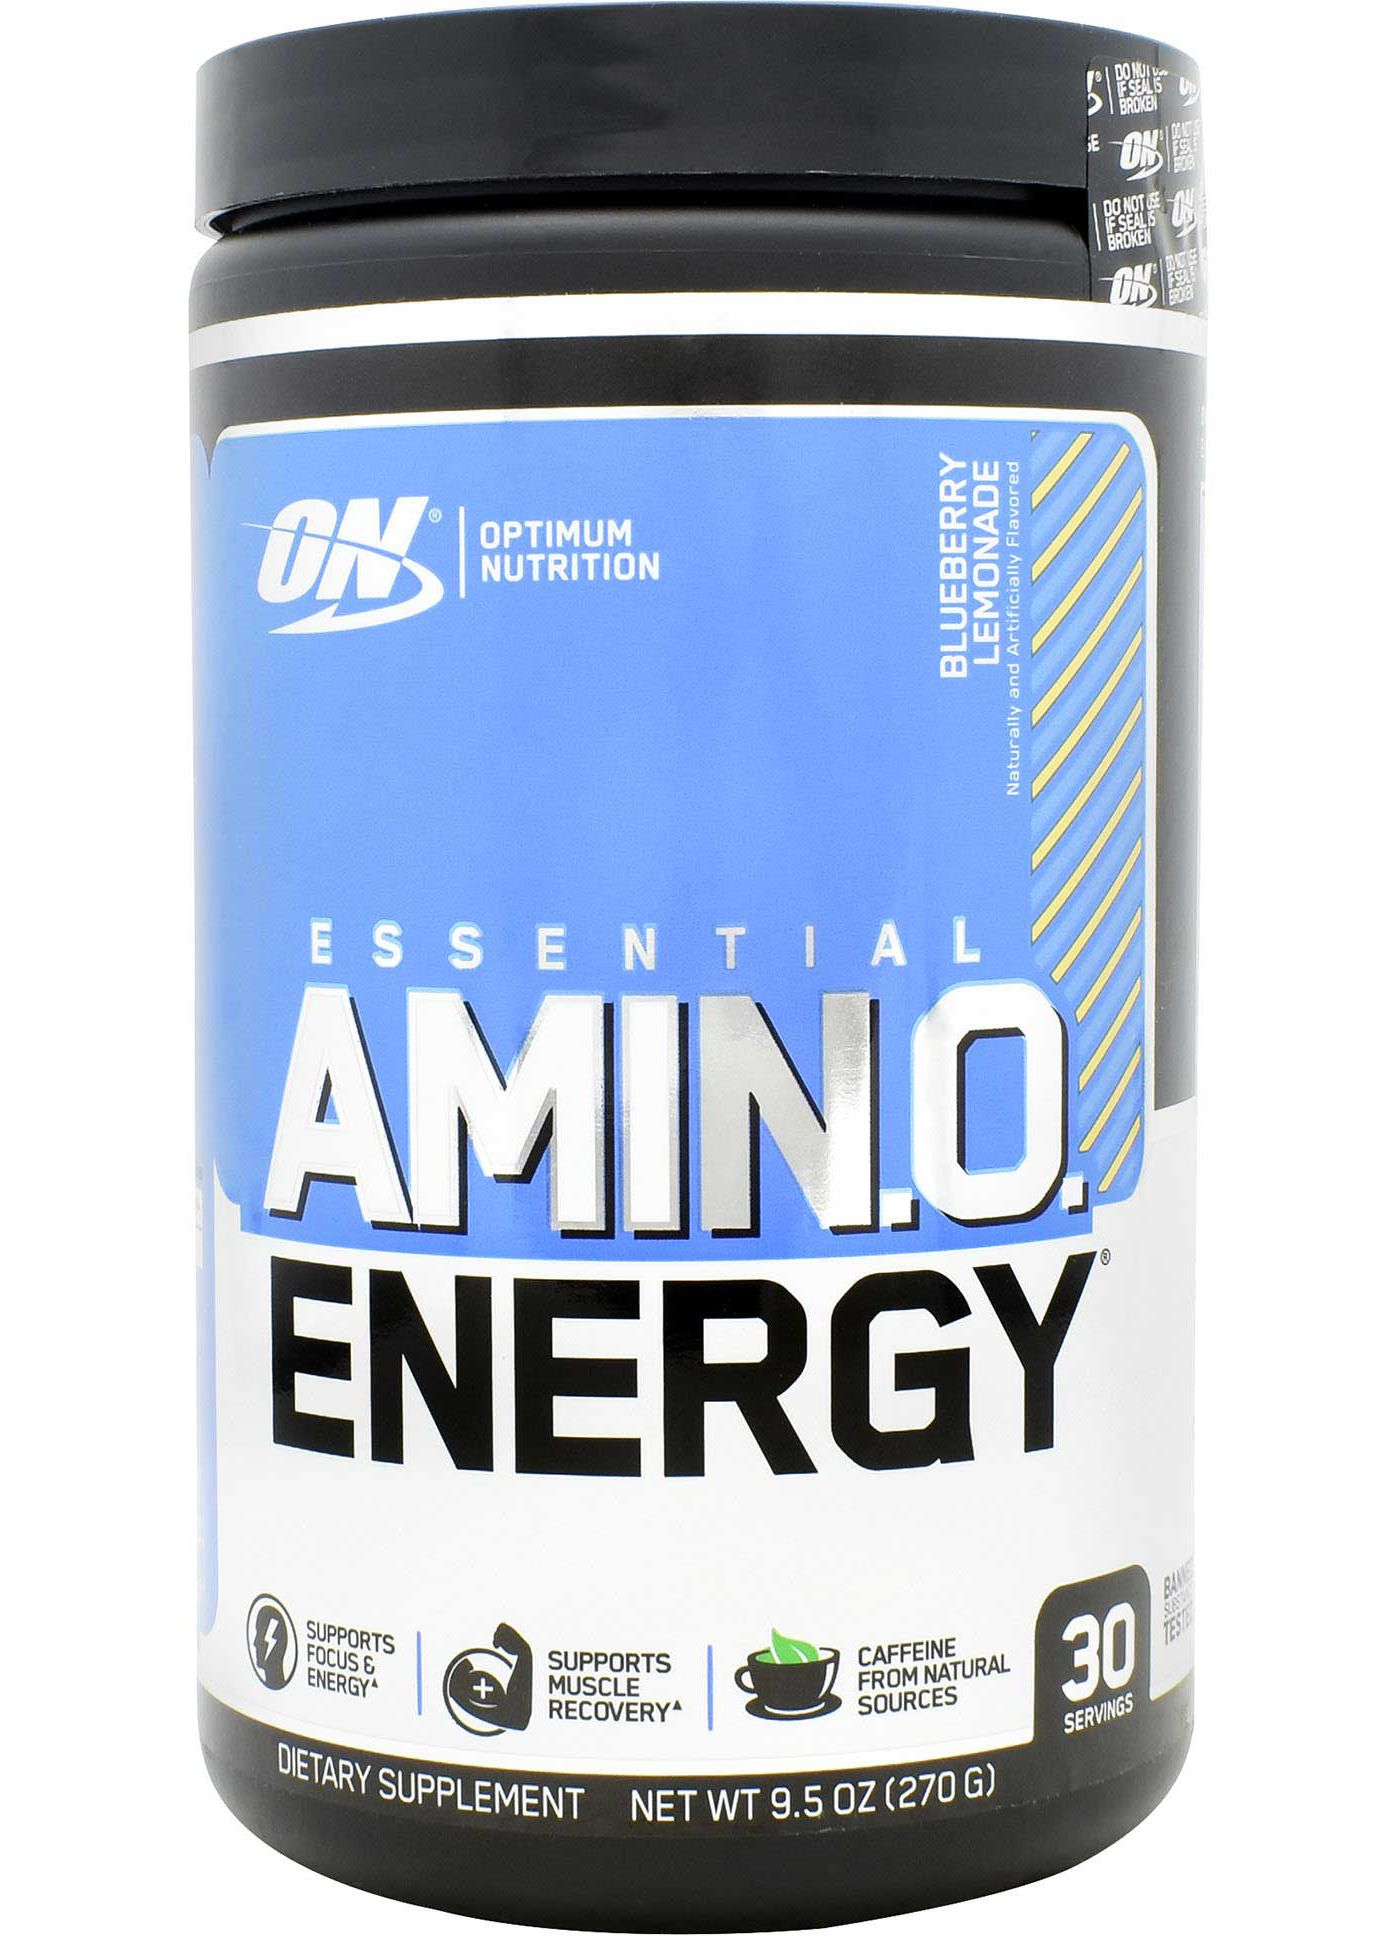 Optimum Nutrition Essential Amino Energy Blueberry Lemonade 30 Servings